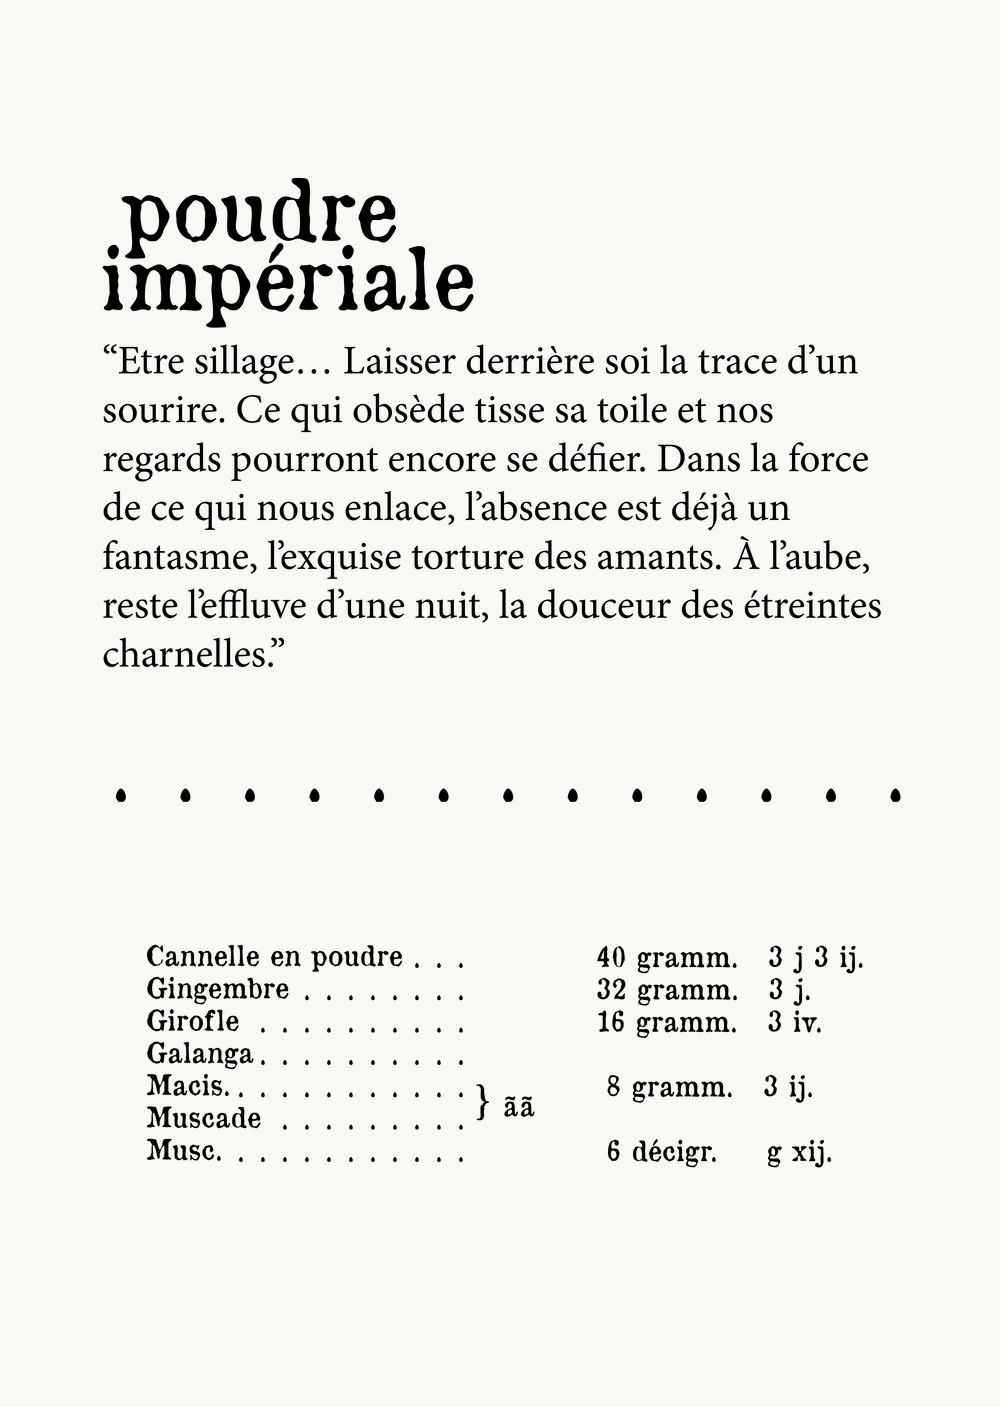 website poudre imperiale fr.jpg